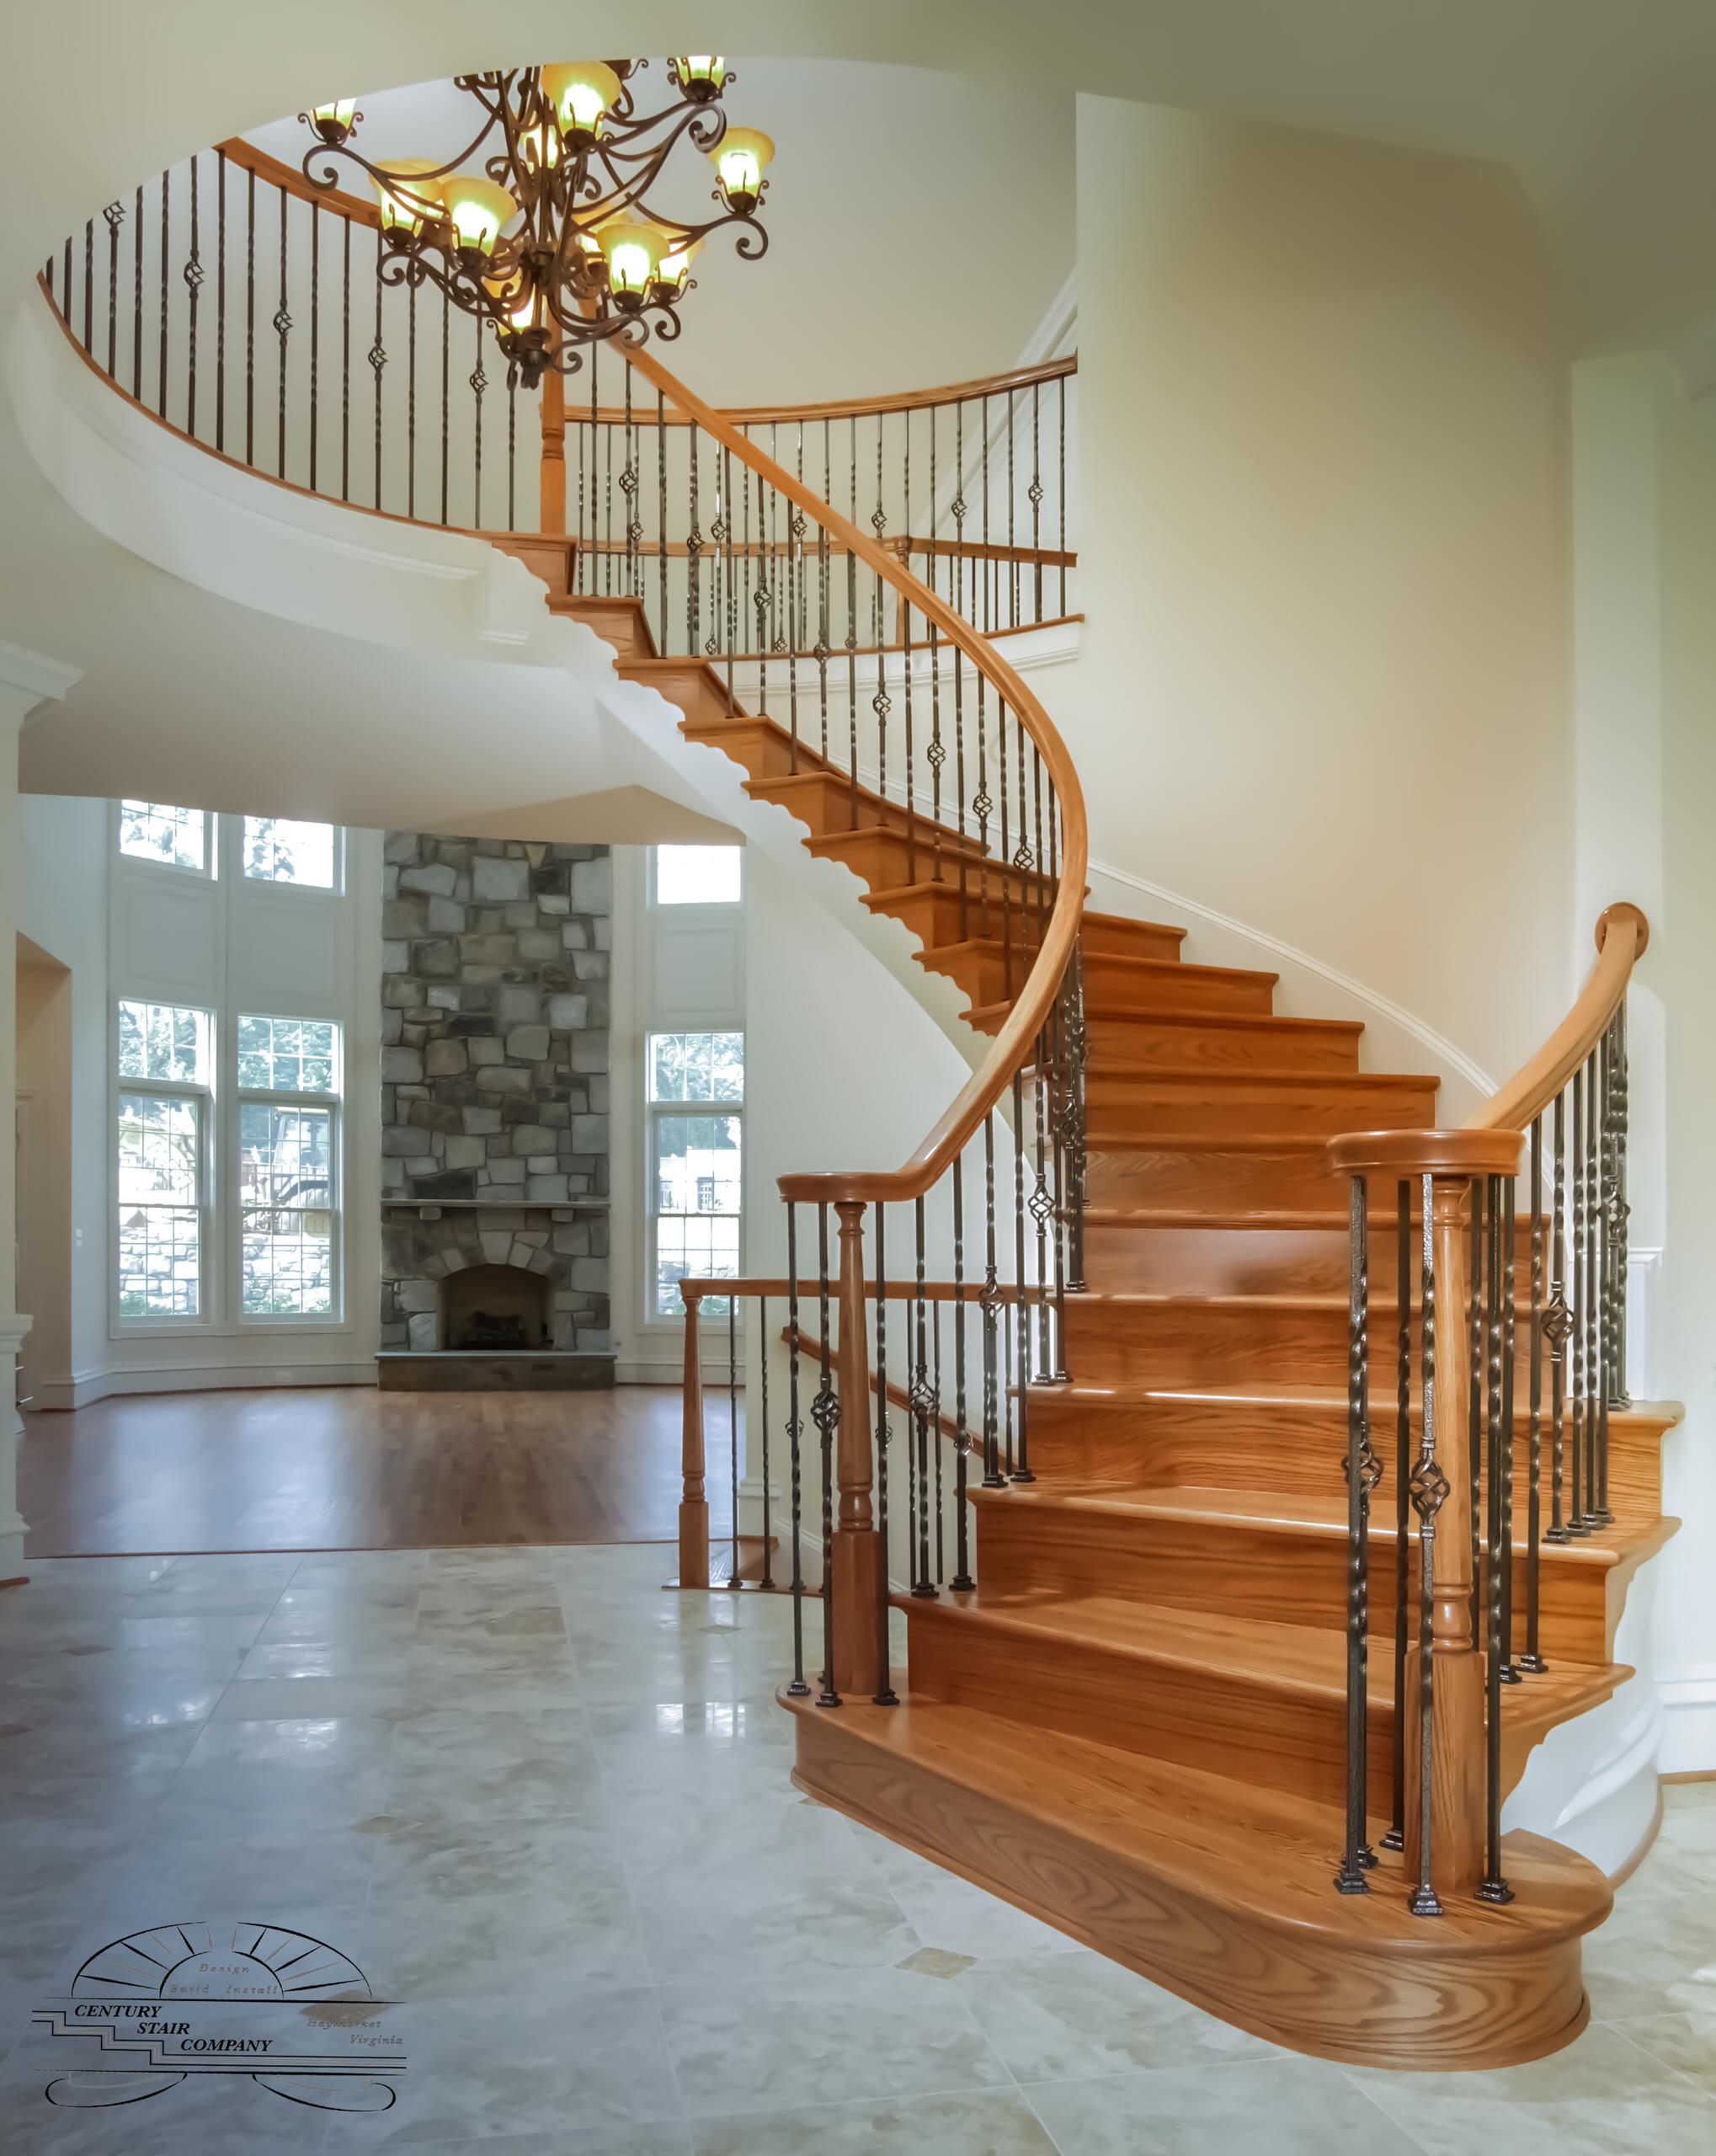 14_Entryway Transformation – Spiral Freestanding Staircase, Gainesville VA 20155